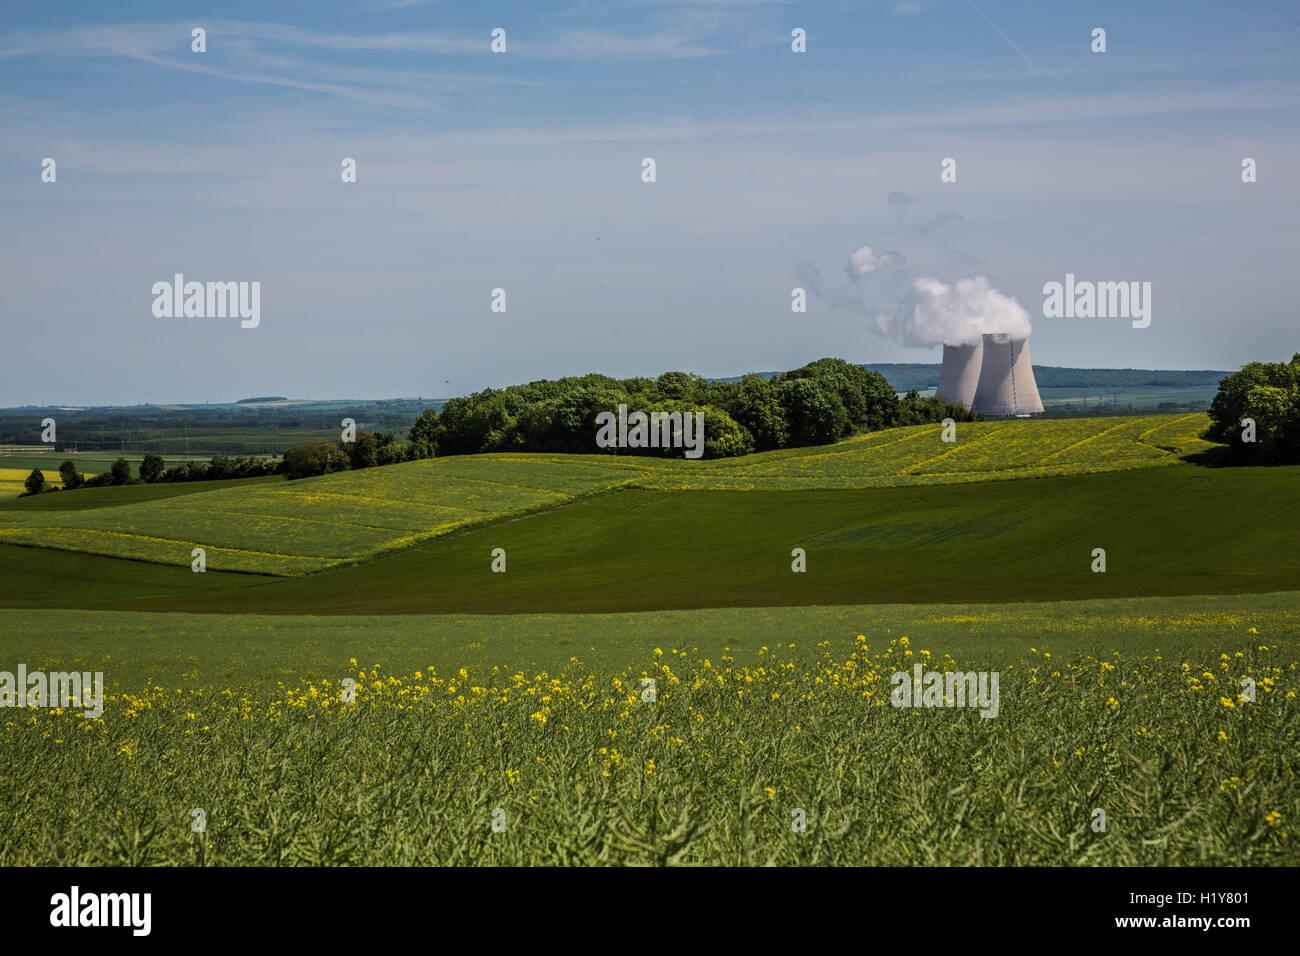 Nuclear power plant of Nogent-sur-Seine, Aube, France. Stock Photo